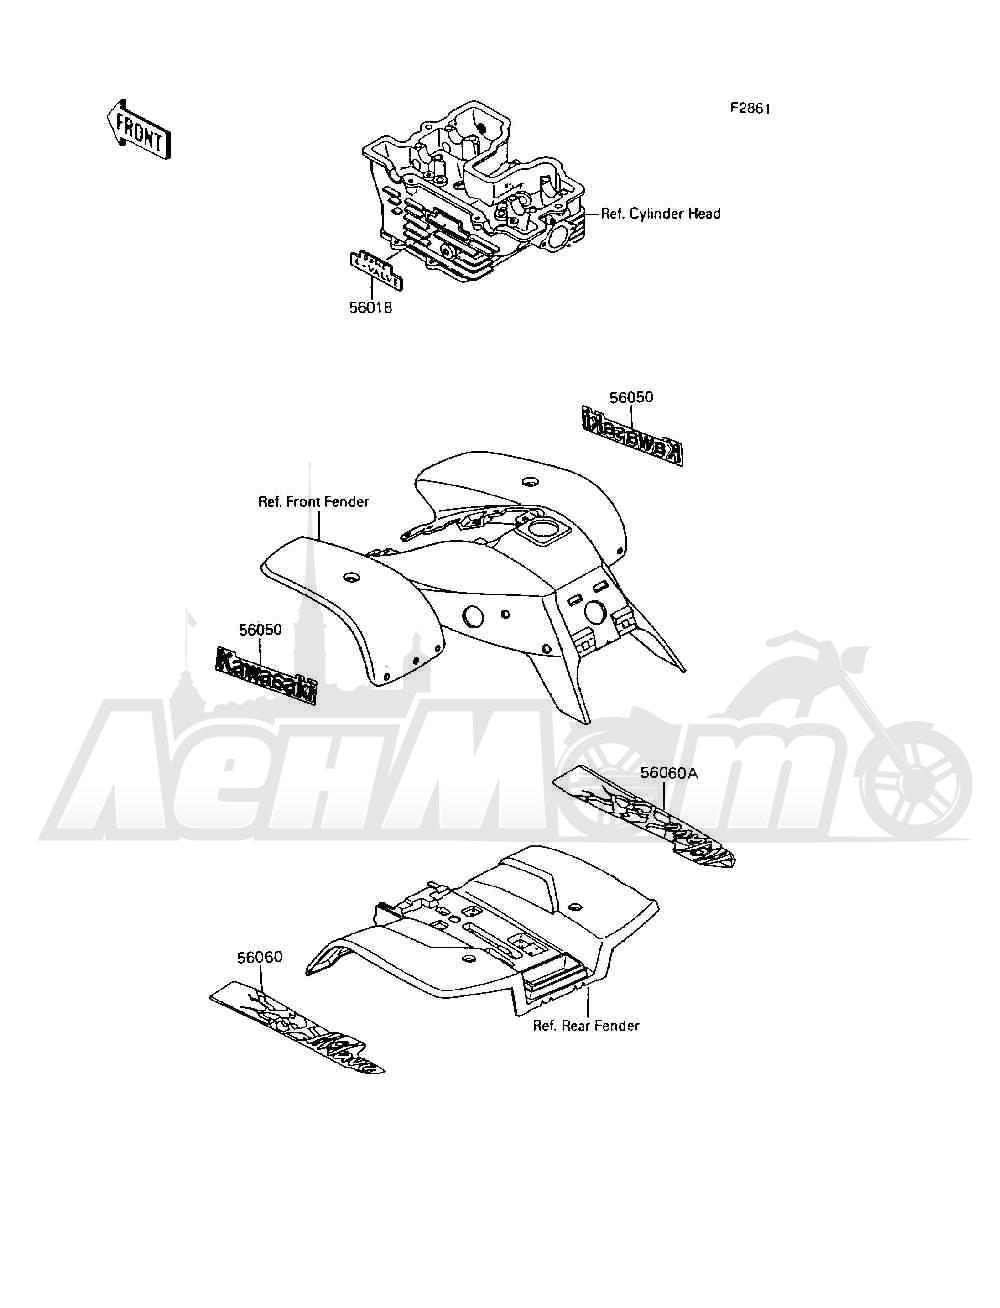 Запчасти для Квадроцикла Kawasaki 1994 MOJAVE 250 (KSF250-A8) Раздел: DECALS | наклейки